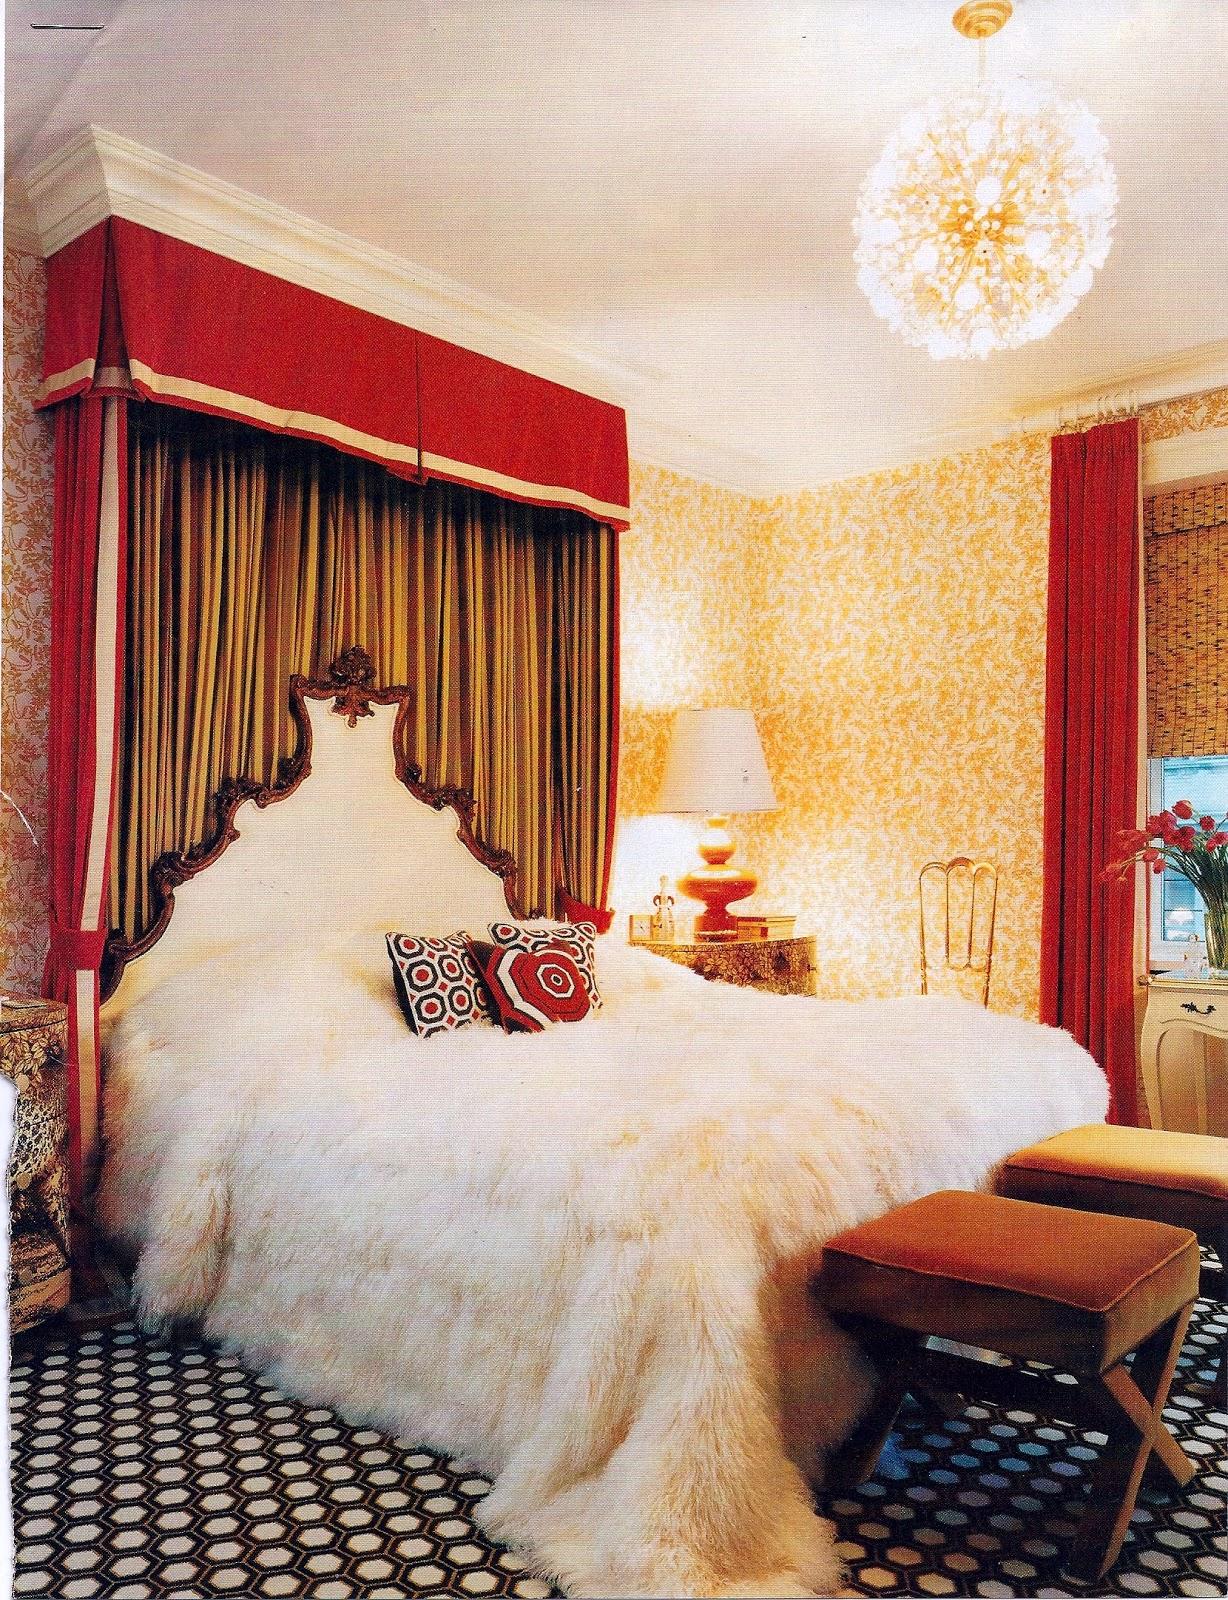 Design Redux Bed Time Part VIII Fantasy - Jonathan adler bedroom